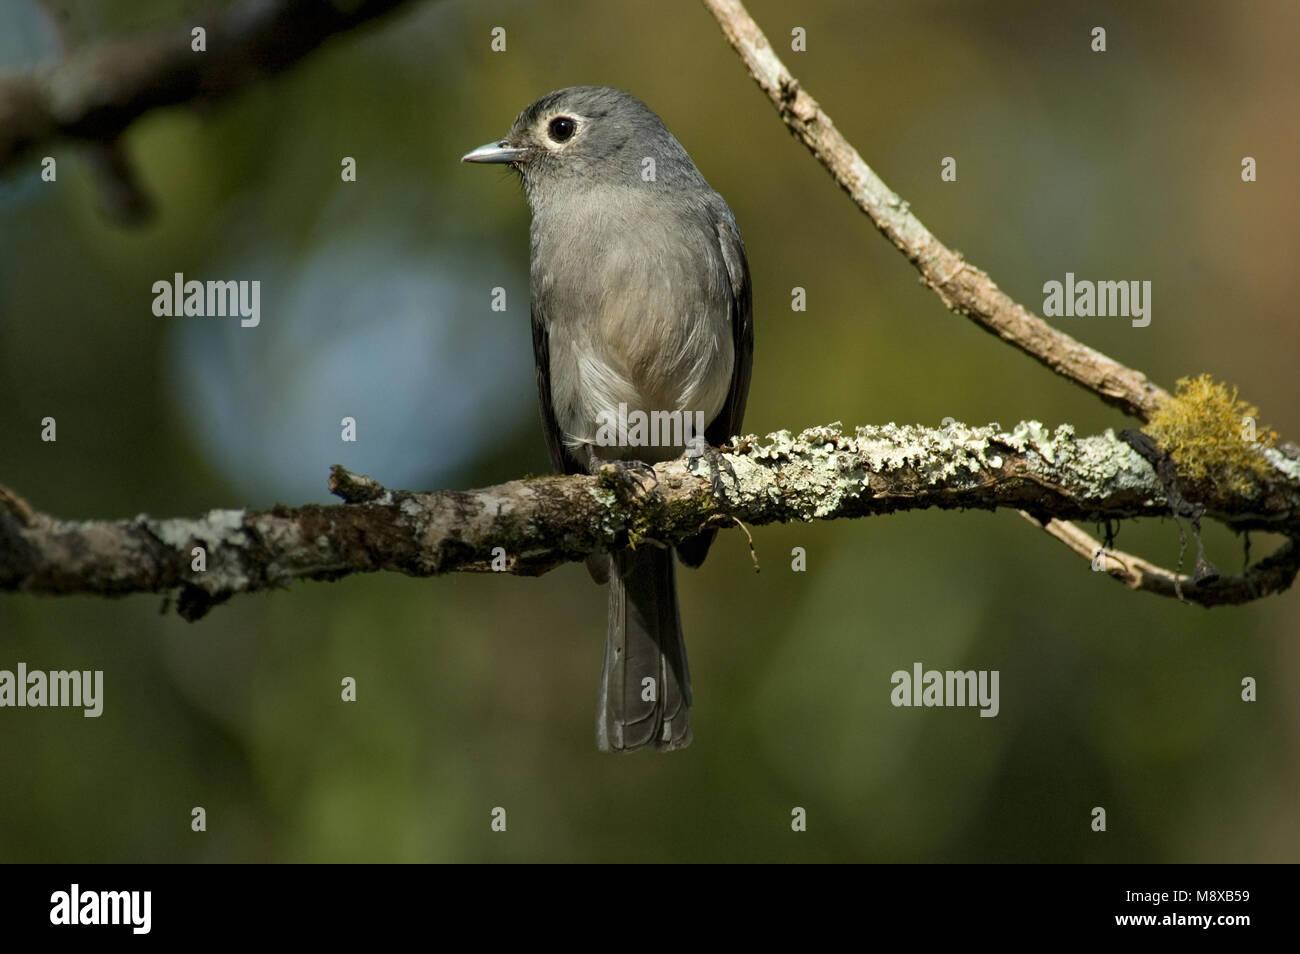 Bergdrongovliegenvanger zittend op een tak; White-eyed Slaty Flycatcher perched on a branch - Stock Image